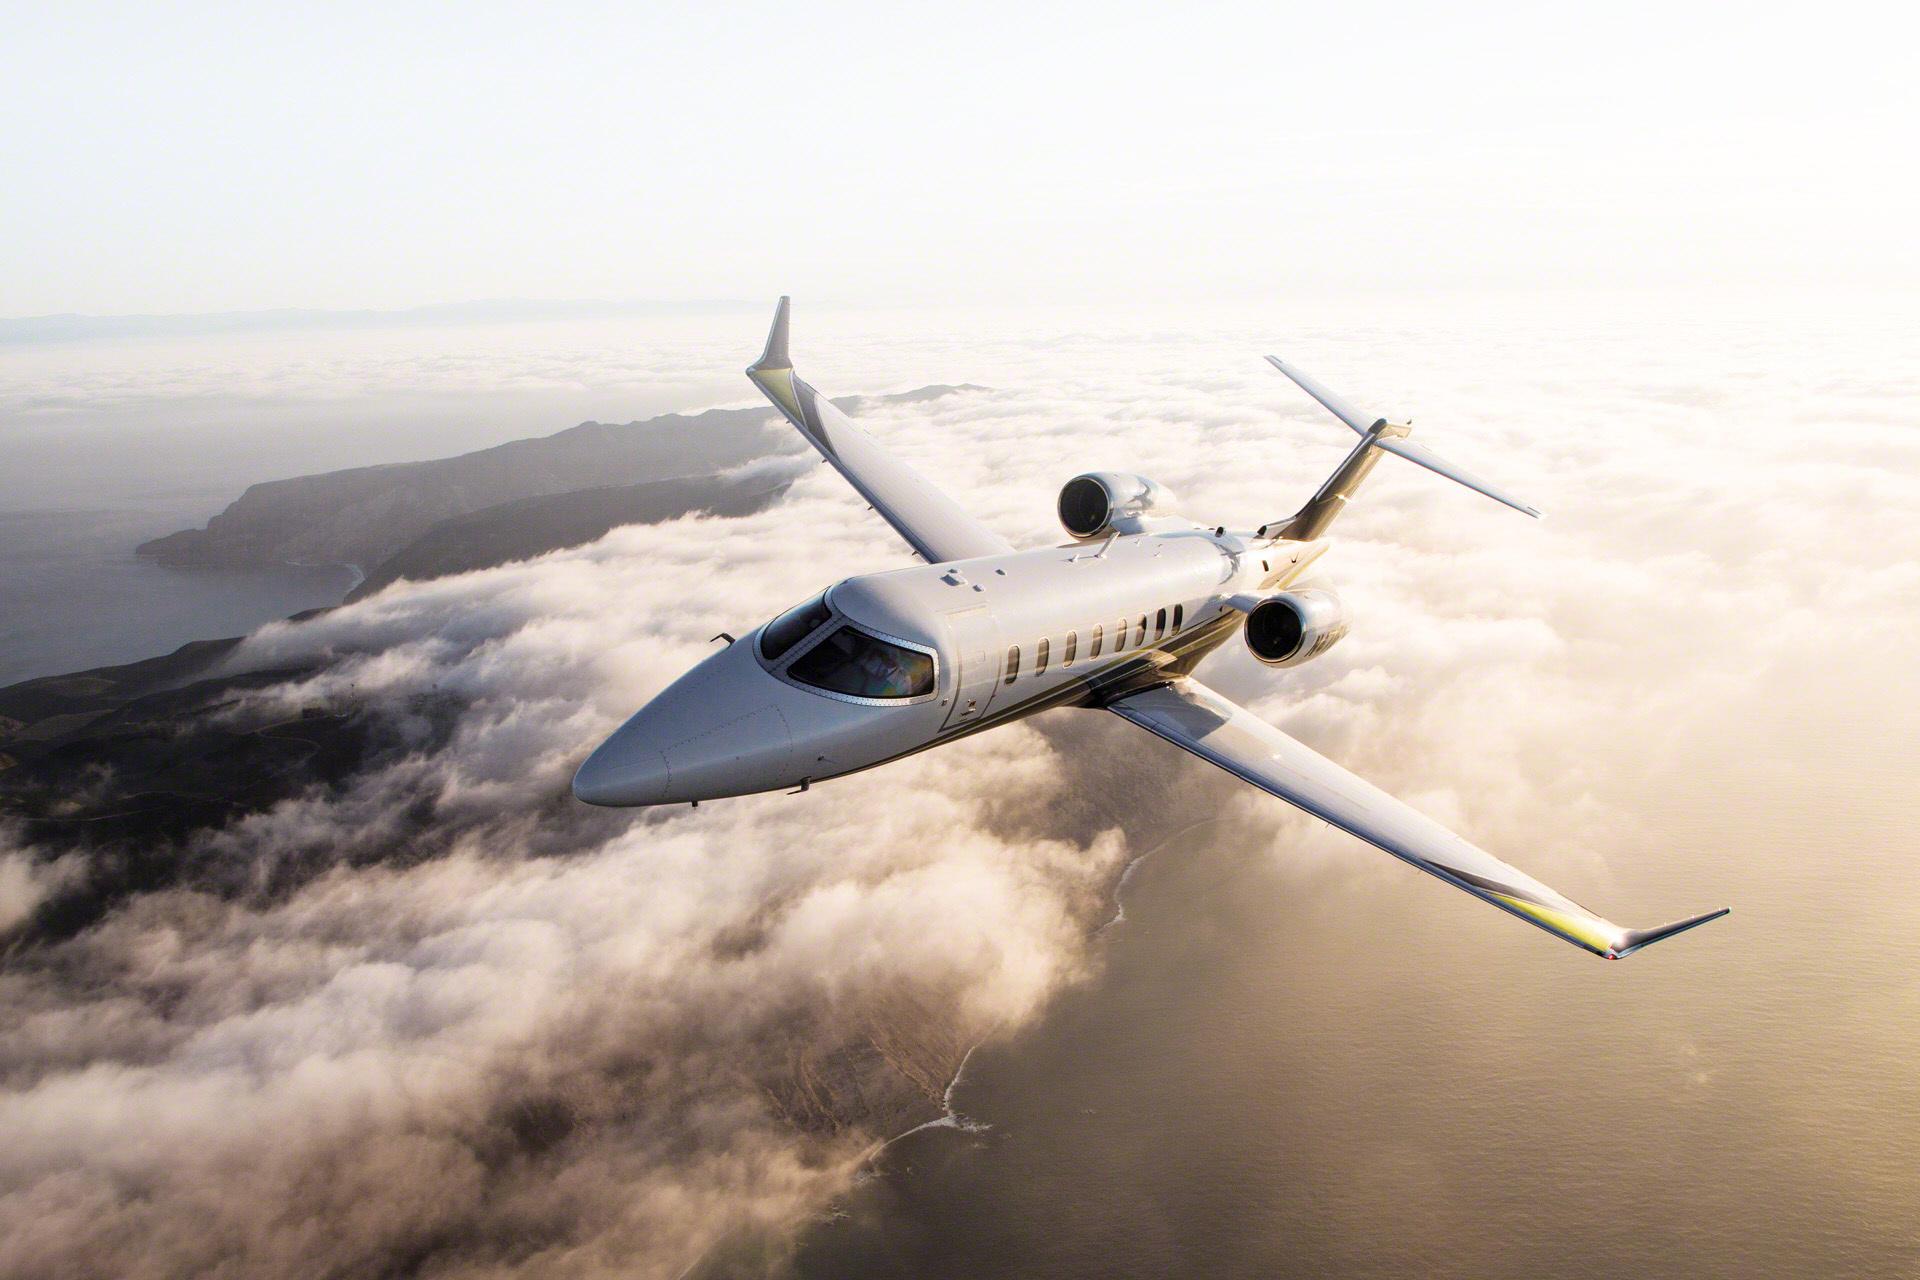 Lear-75_Light-Jet_Exterior-1_Legacy_Aviation_Private_Jet_NetJets_Jet_Charter_TEB_VNY_MIA_PBI_FRG_SFO_FLL_FXE_BED